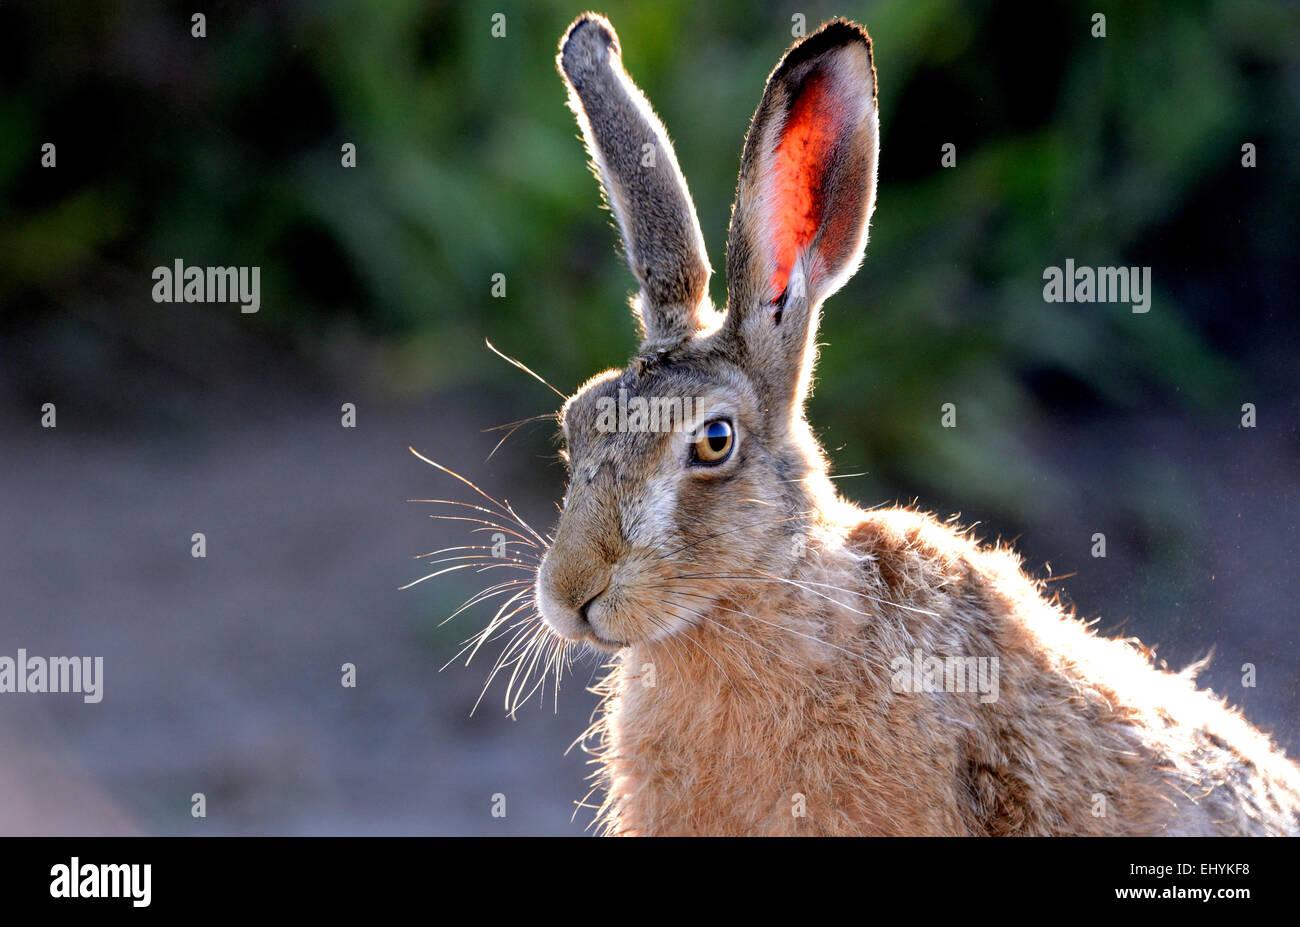 Hare, Rabbit, Lepus europaeus Pallas, brown hare, Eoropean hare, animal, wild animal, game, low game, Germany - Stock Image